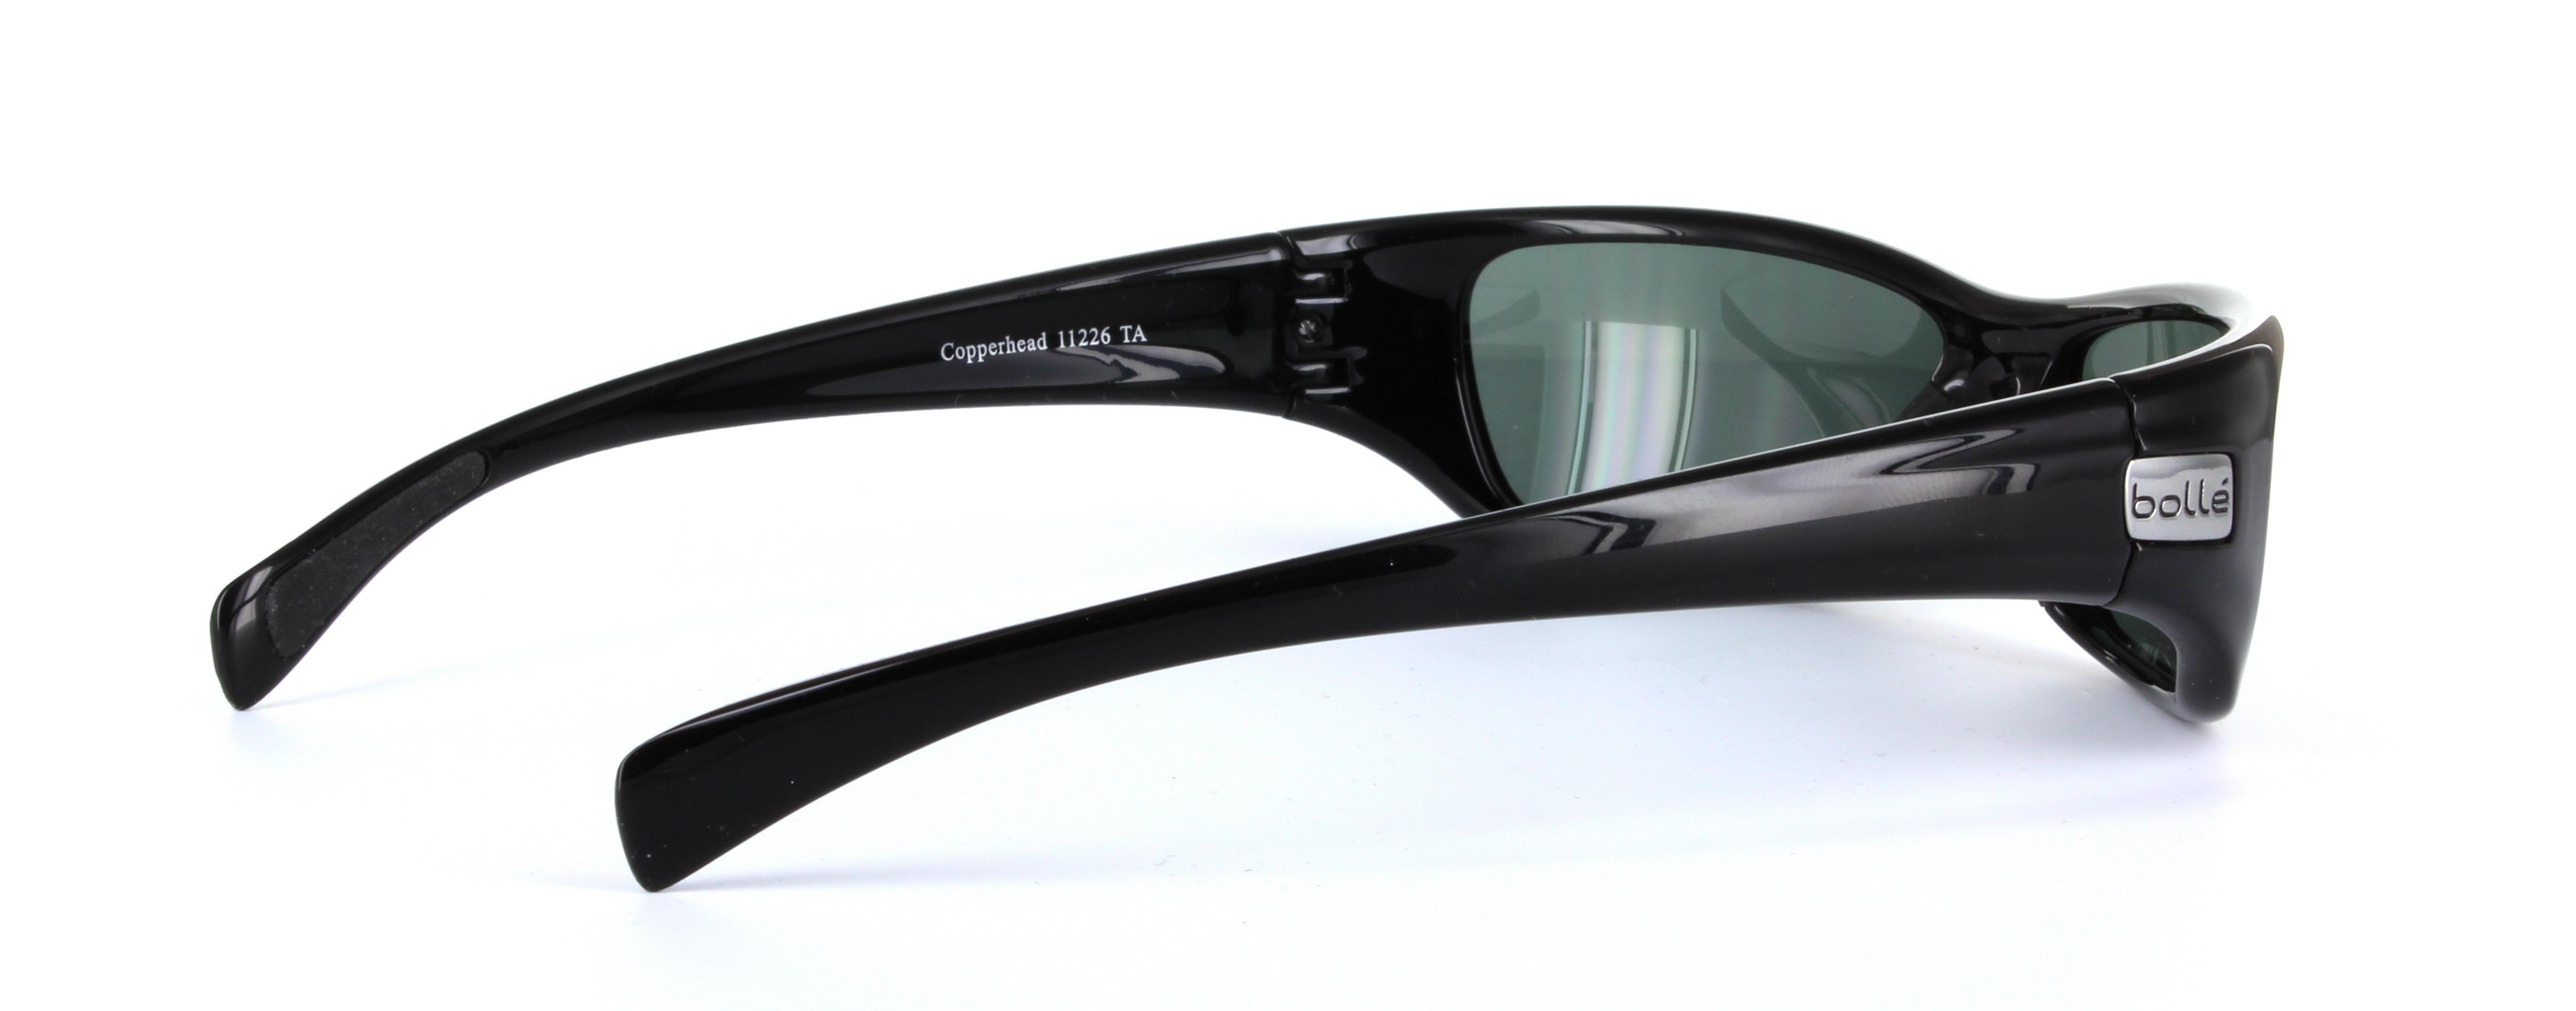 SunglassesDiscount Eyewear Bolle Copperhead Glasses2you Eyewear Bolle SunglassesDiscount Copperhead Glasses2you Bolle Copperhead TF1lJucK3